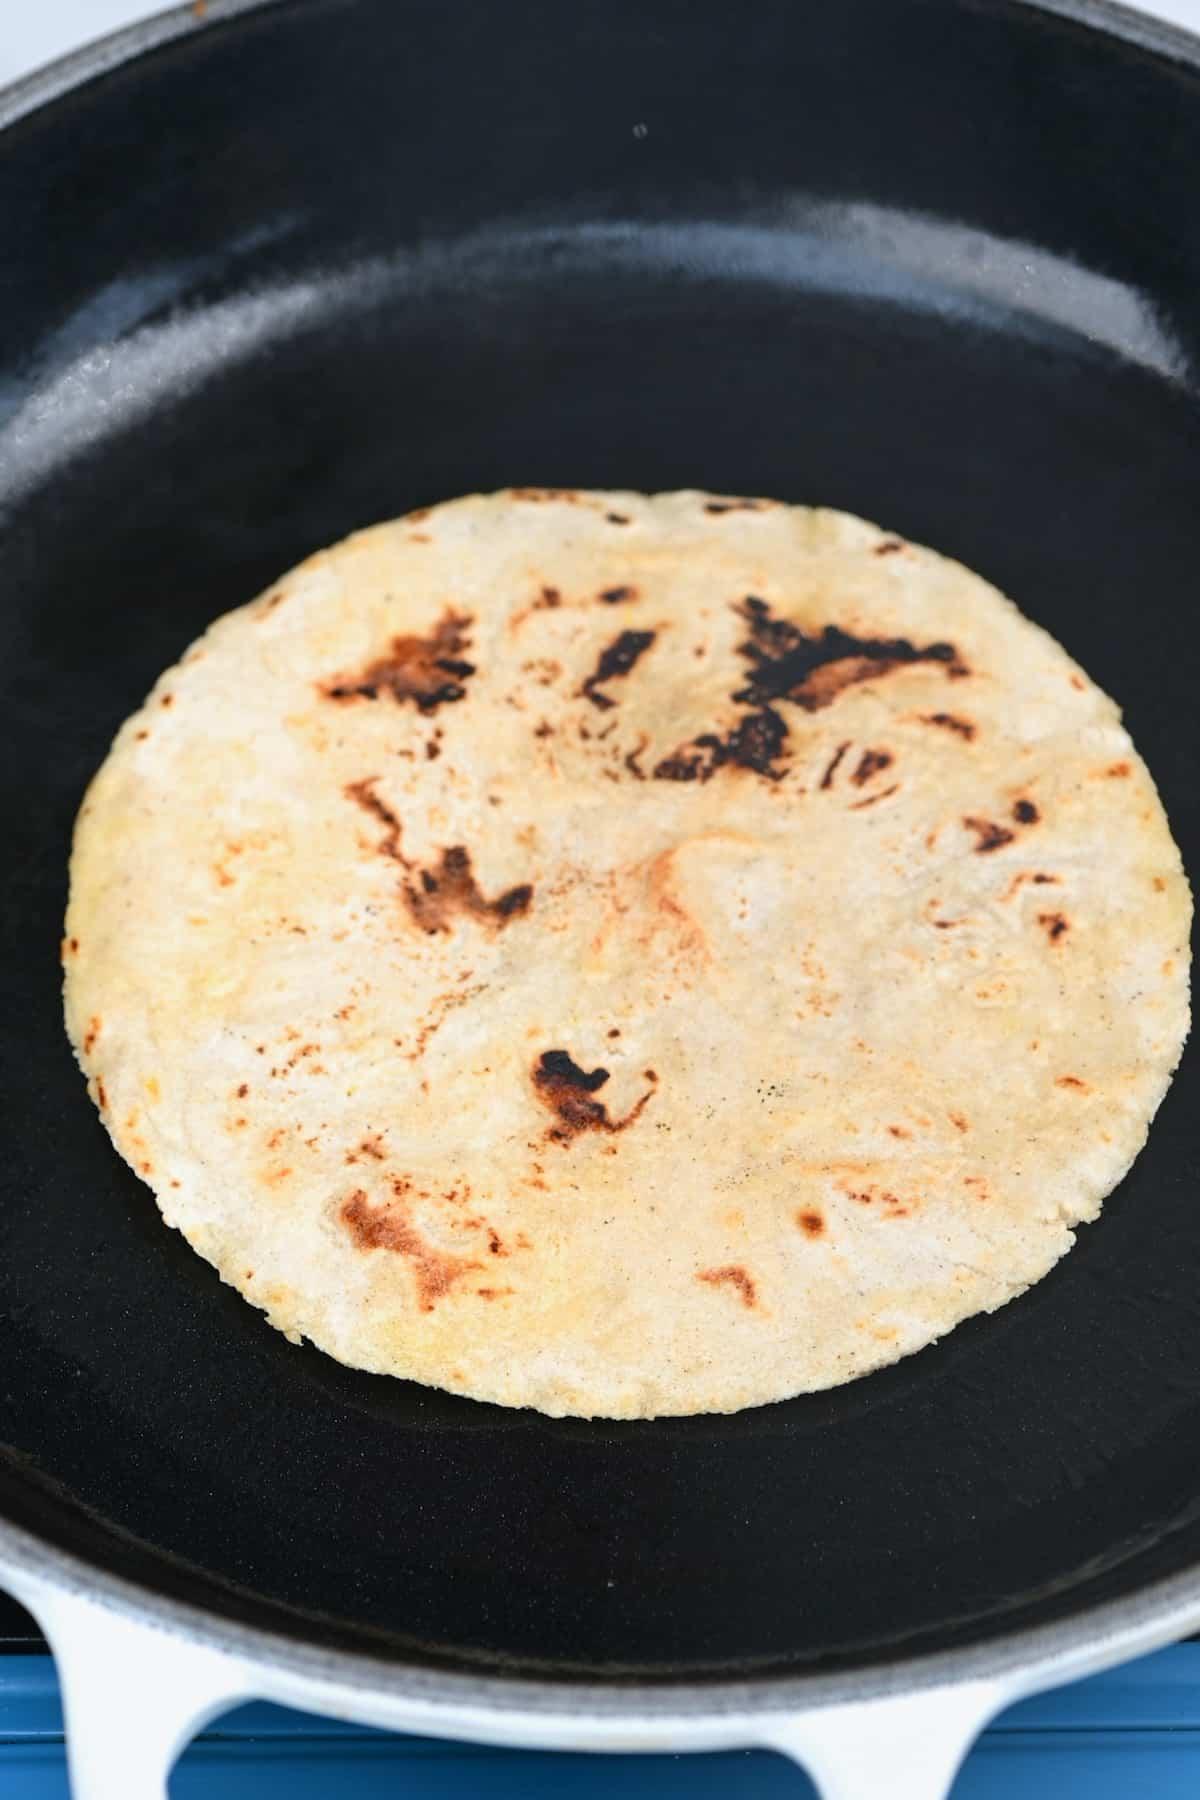 Fried corn tortilla in a pan